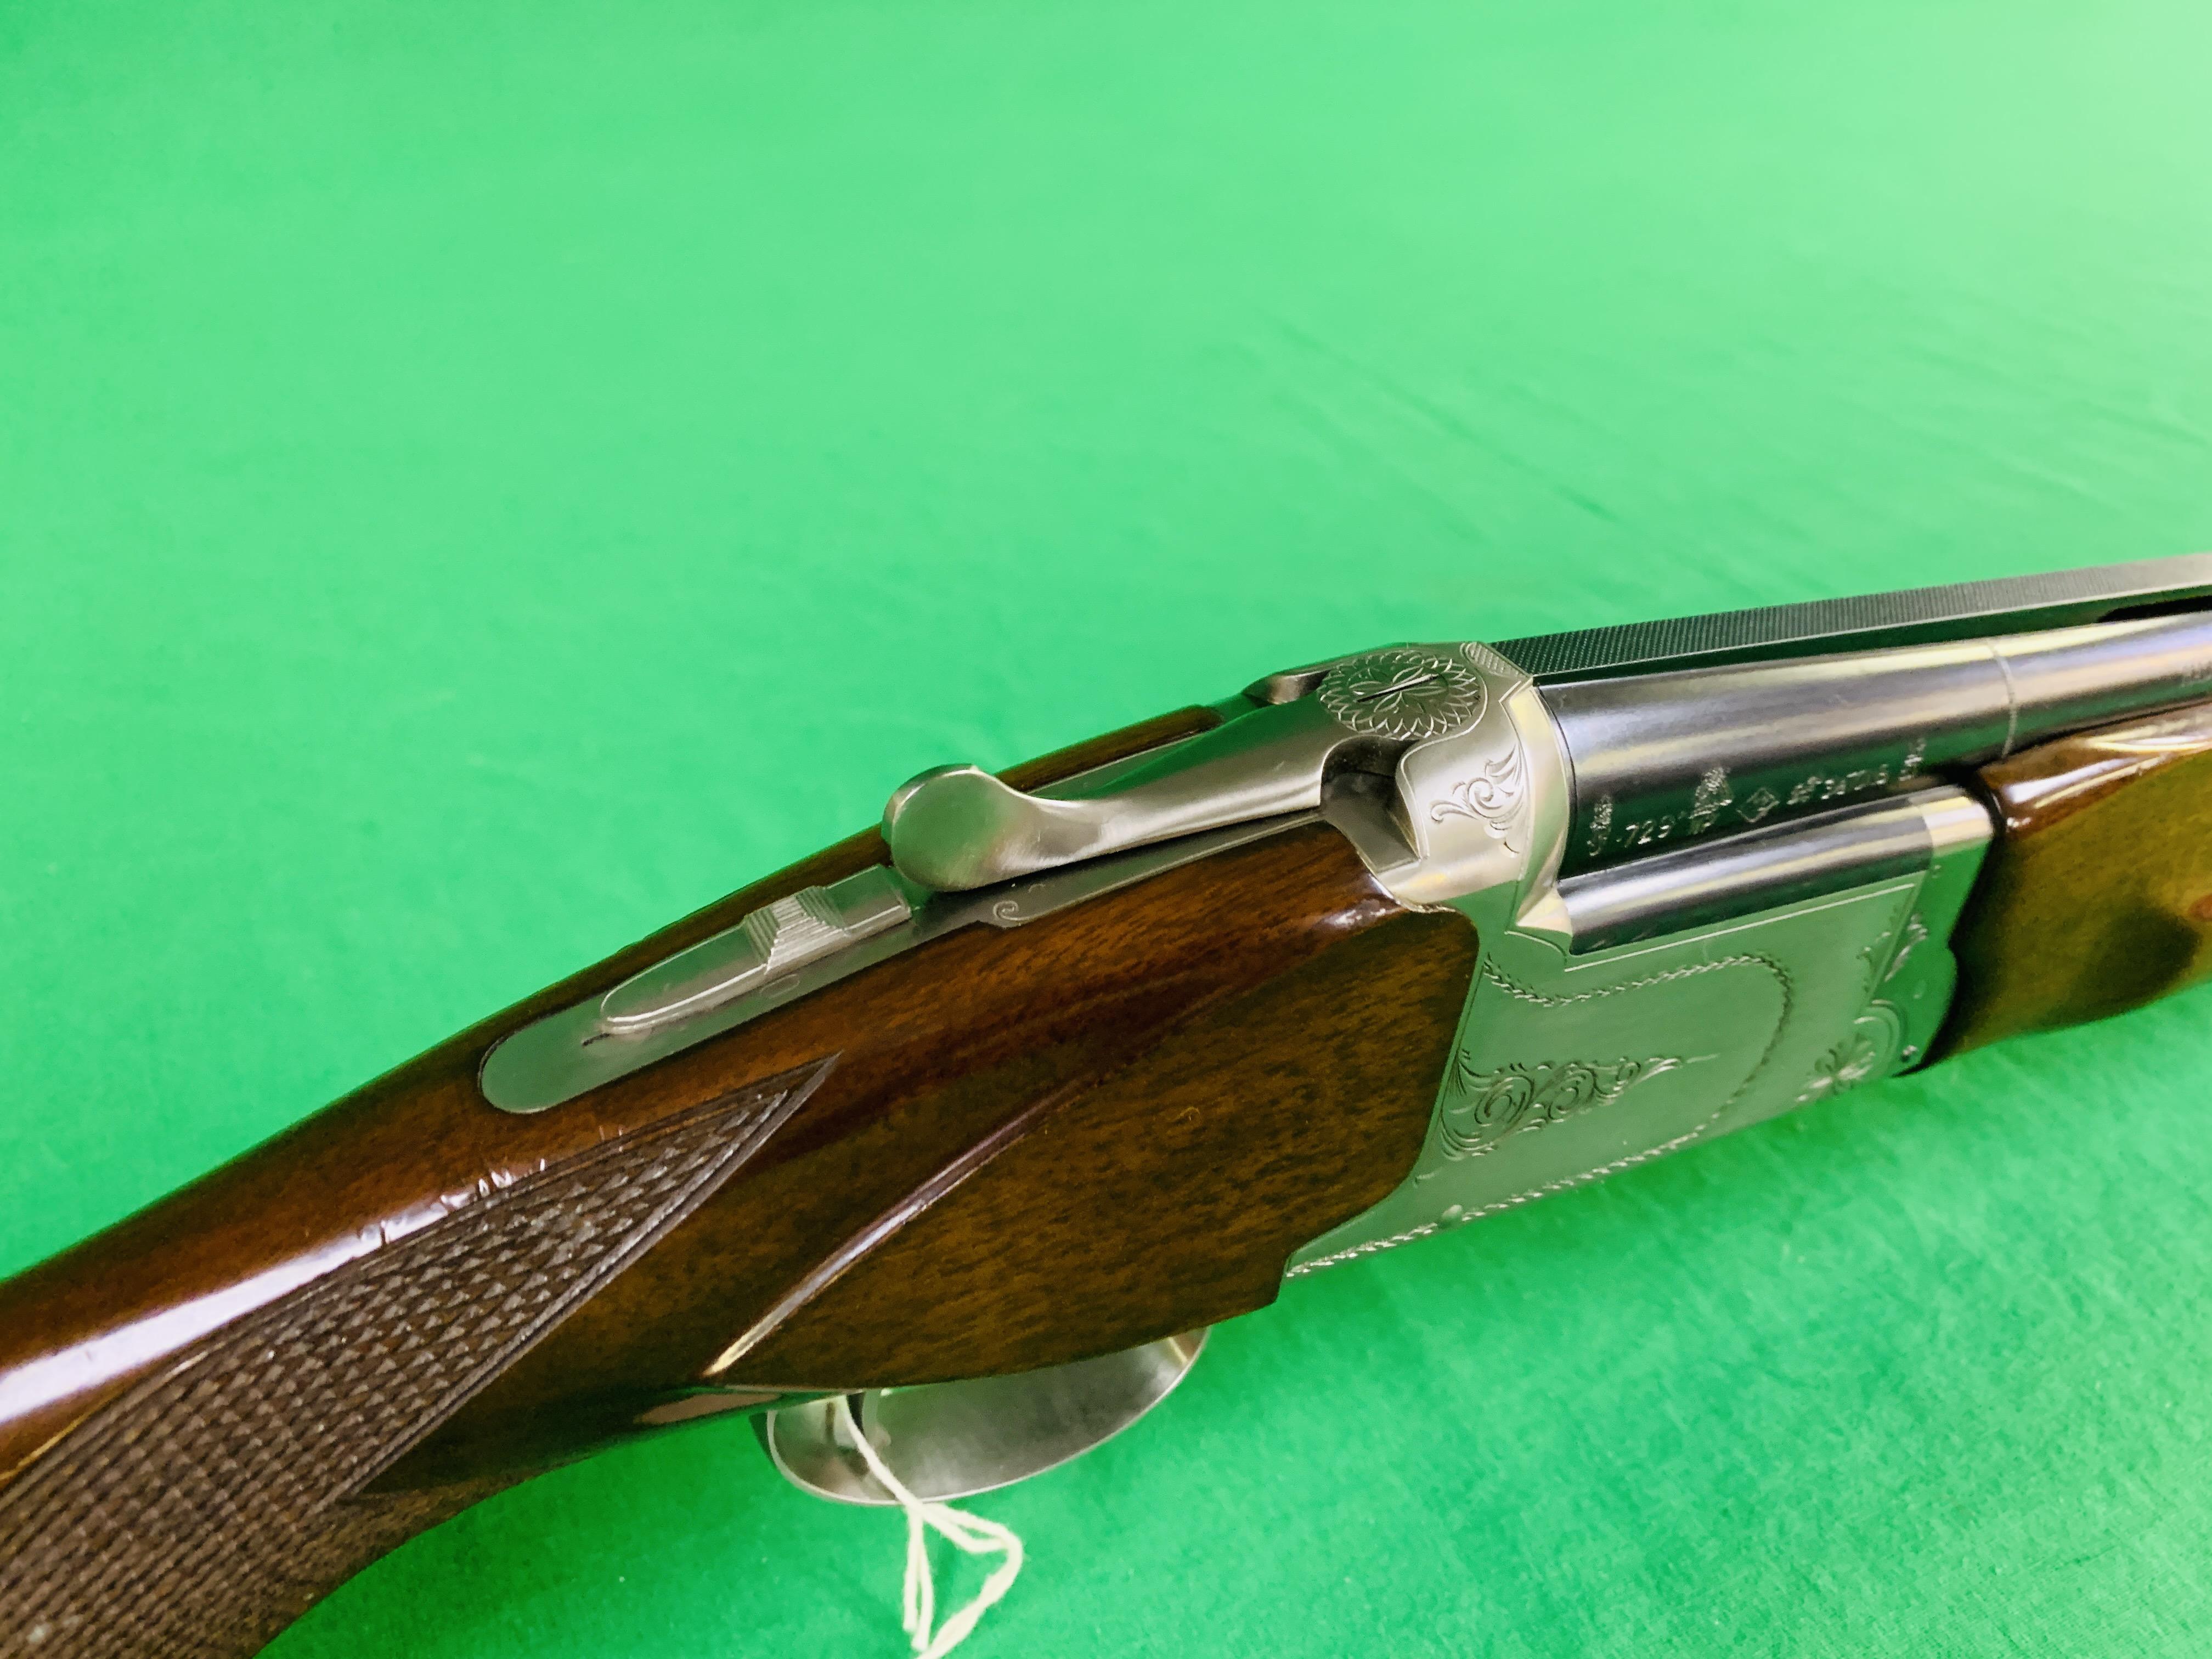 NIKKO 5000 12 BORE OVER AND UNDER SHOTGUN # K629564 - FIXED CHOKE, - Image 2 of 8